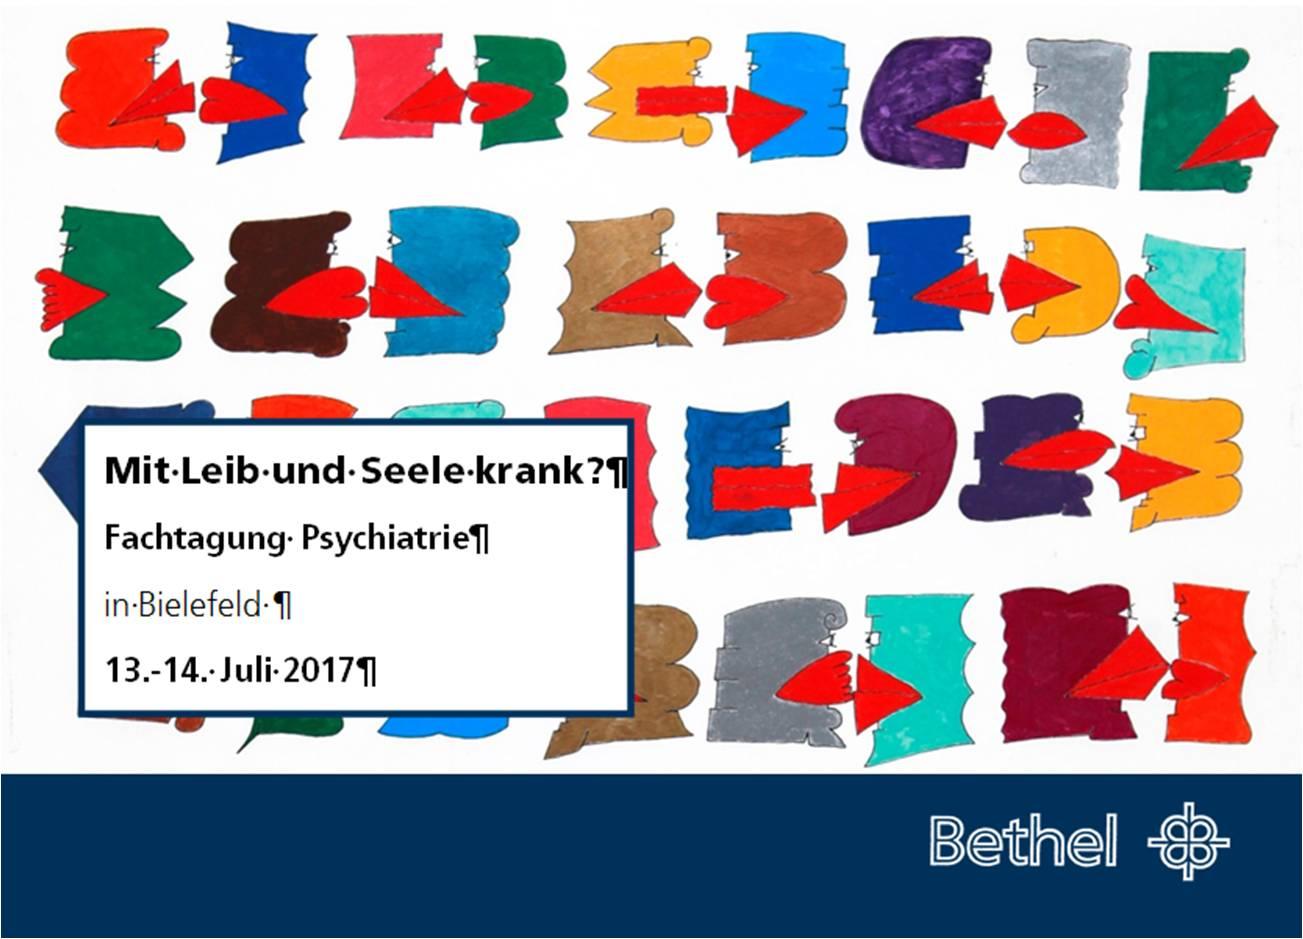 Fachtagung Psychiatrie | Bildung & Beratung Bethel